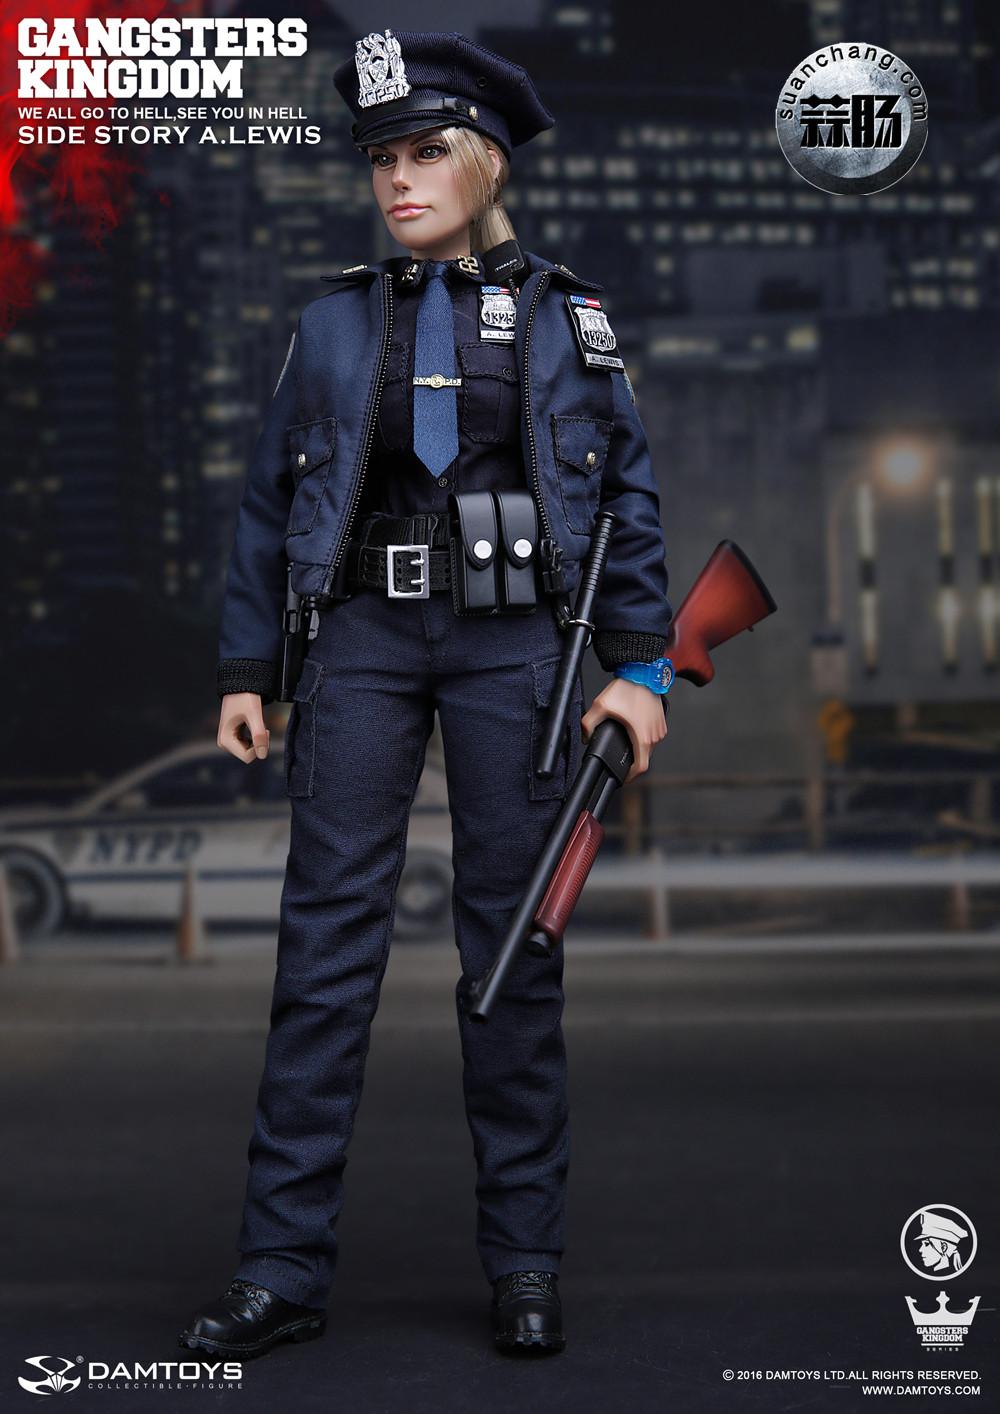 DAMTOYS 1/6黑帮王国系列 番外篇:安妮·刘易斯 警官 模玩 第6张